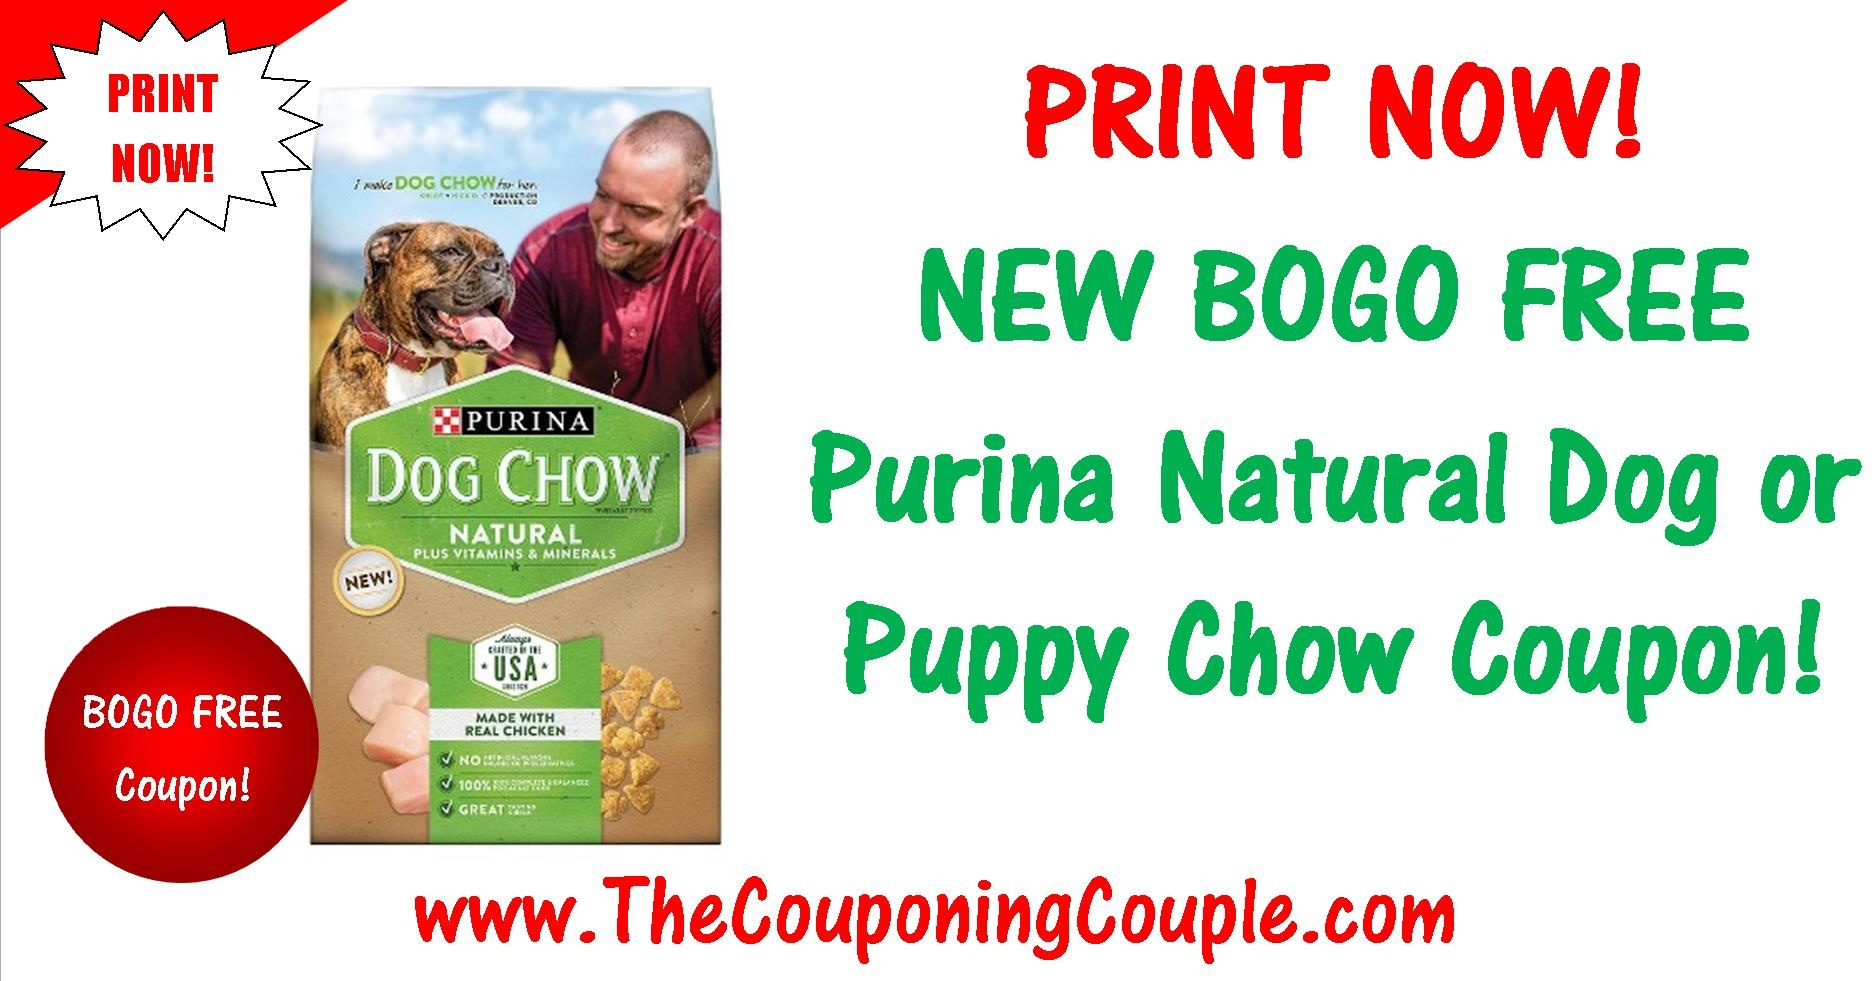 New Bogo Free Purina Natural Printable Coupon ~ Print Now! - Free Printable Nature Made Vitamin Coupons